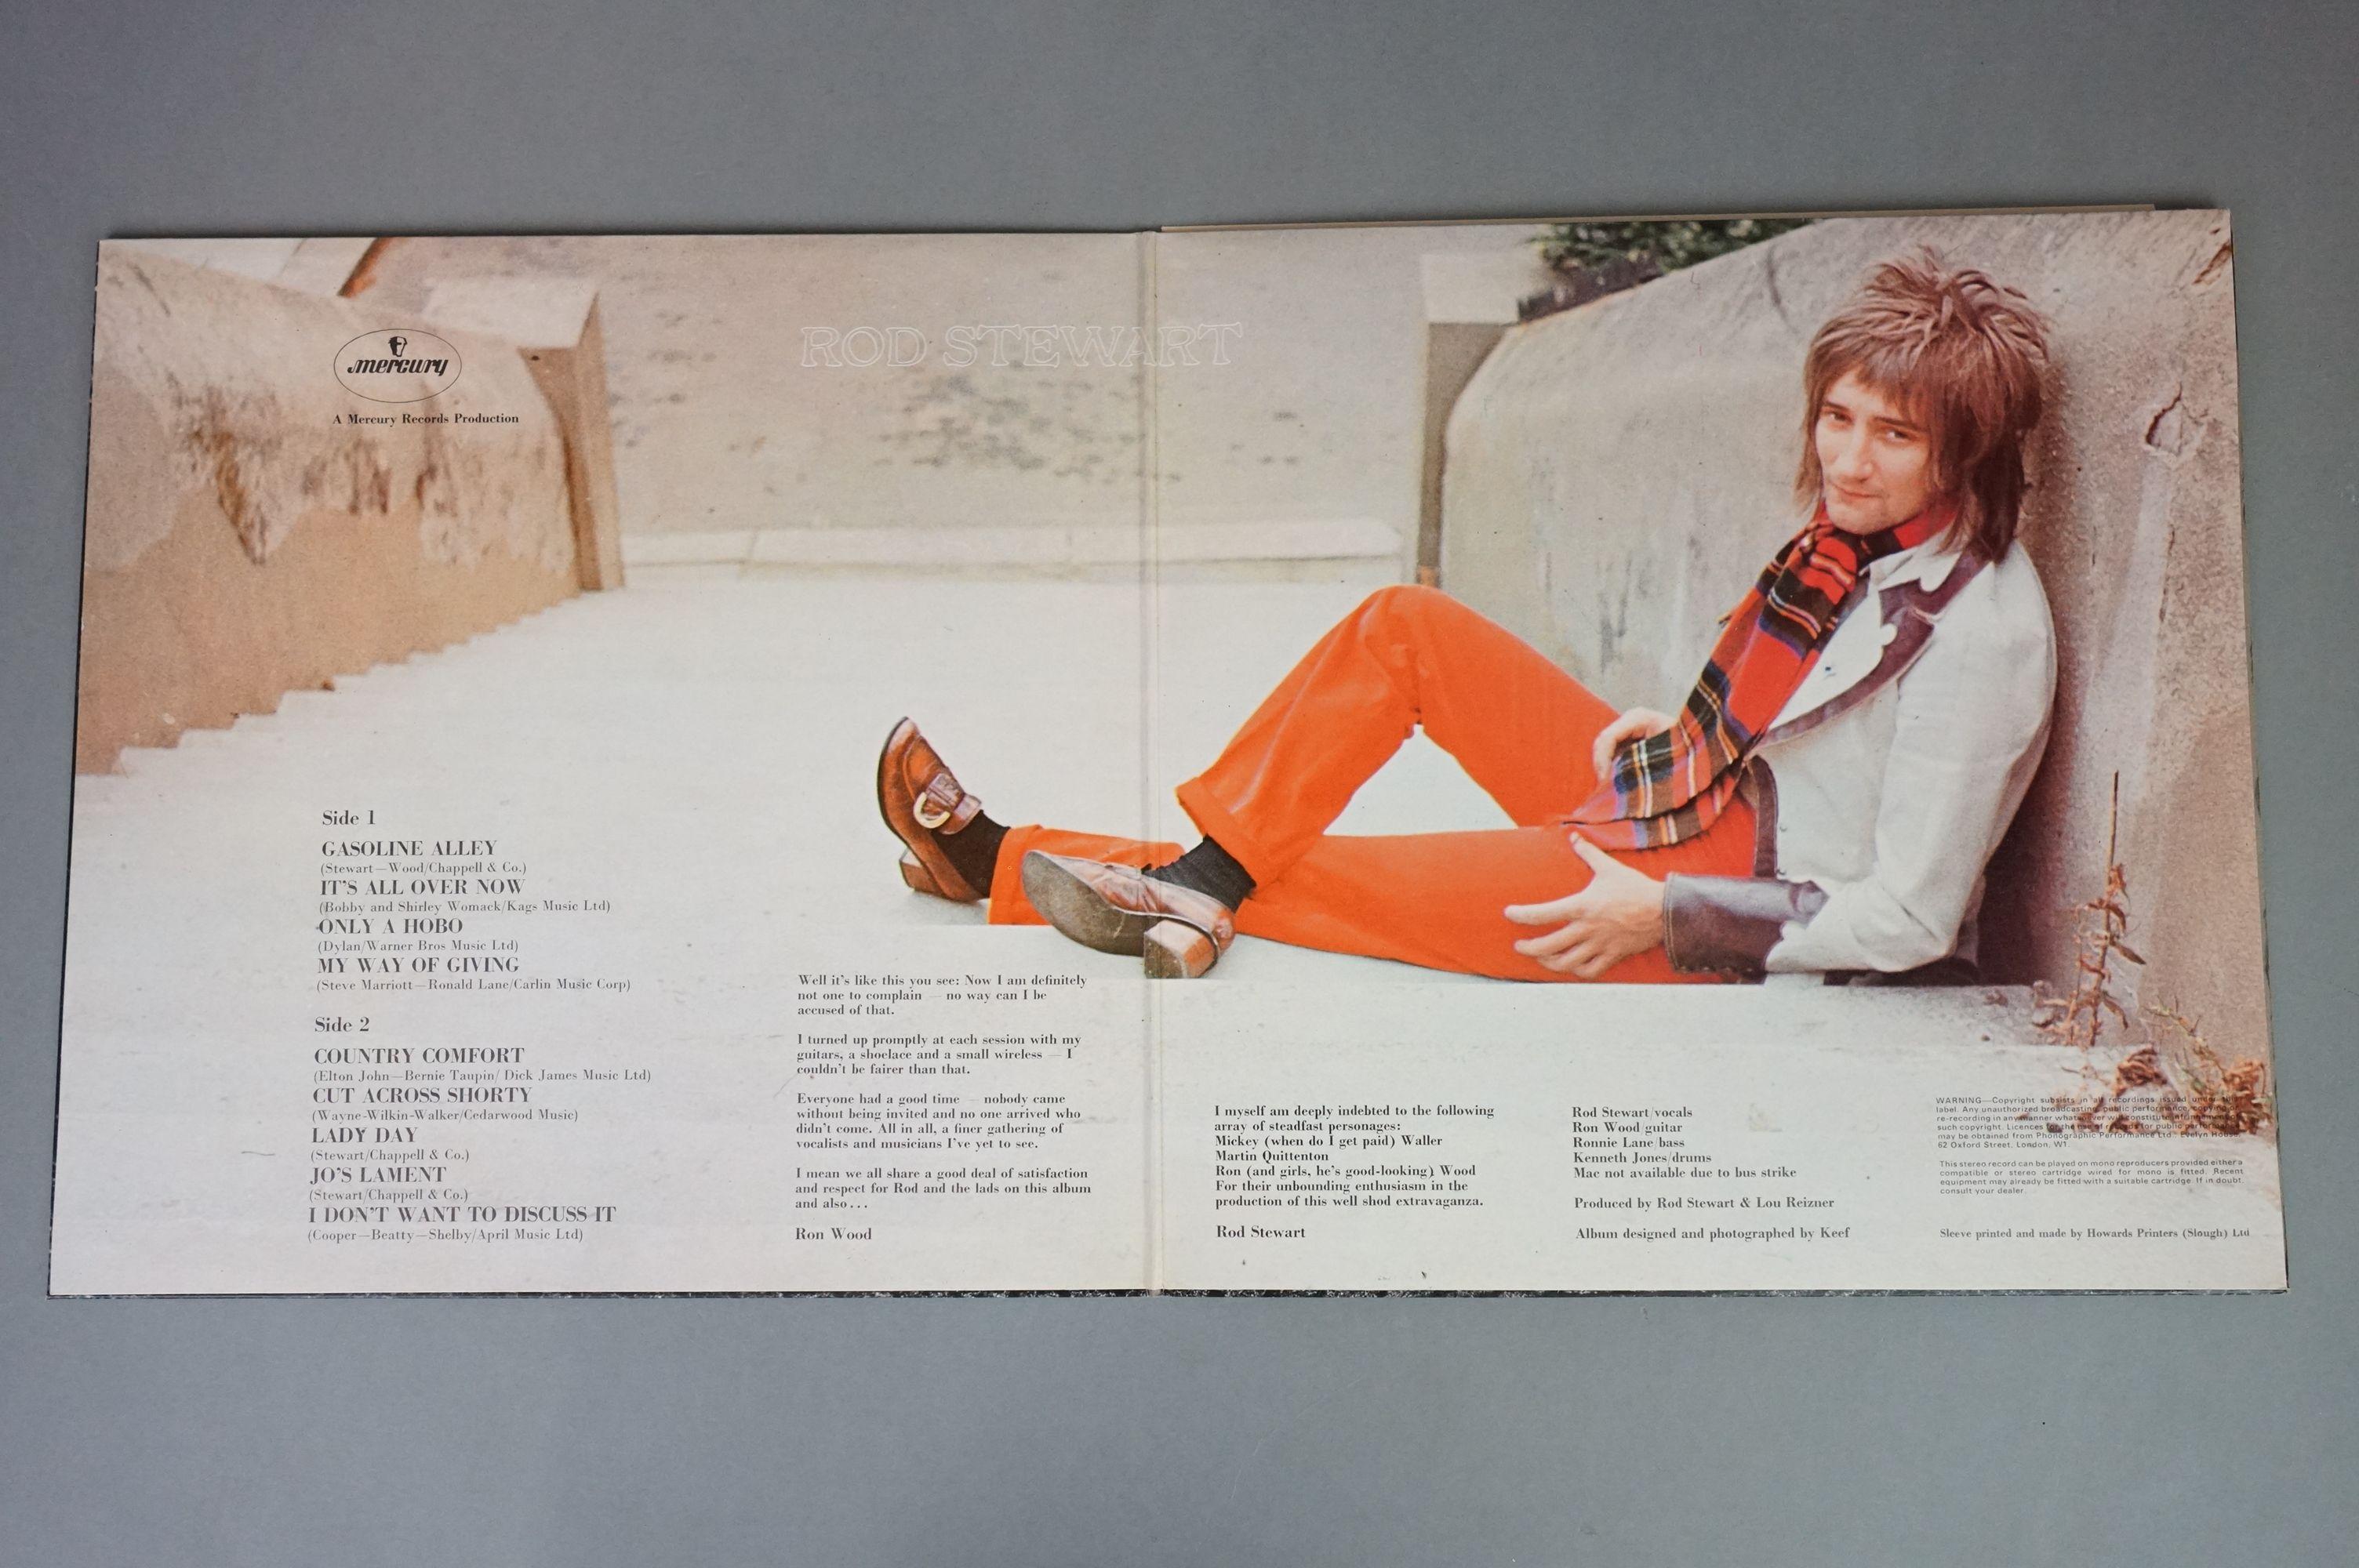 Vinyl - Rod Stewart 4 LP's to include An Old Raincoat Won't Ever Let You Down (Vertigo VO4) gatefold - Image 11 of 14